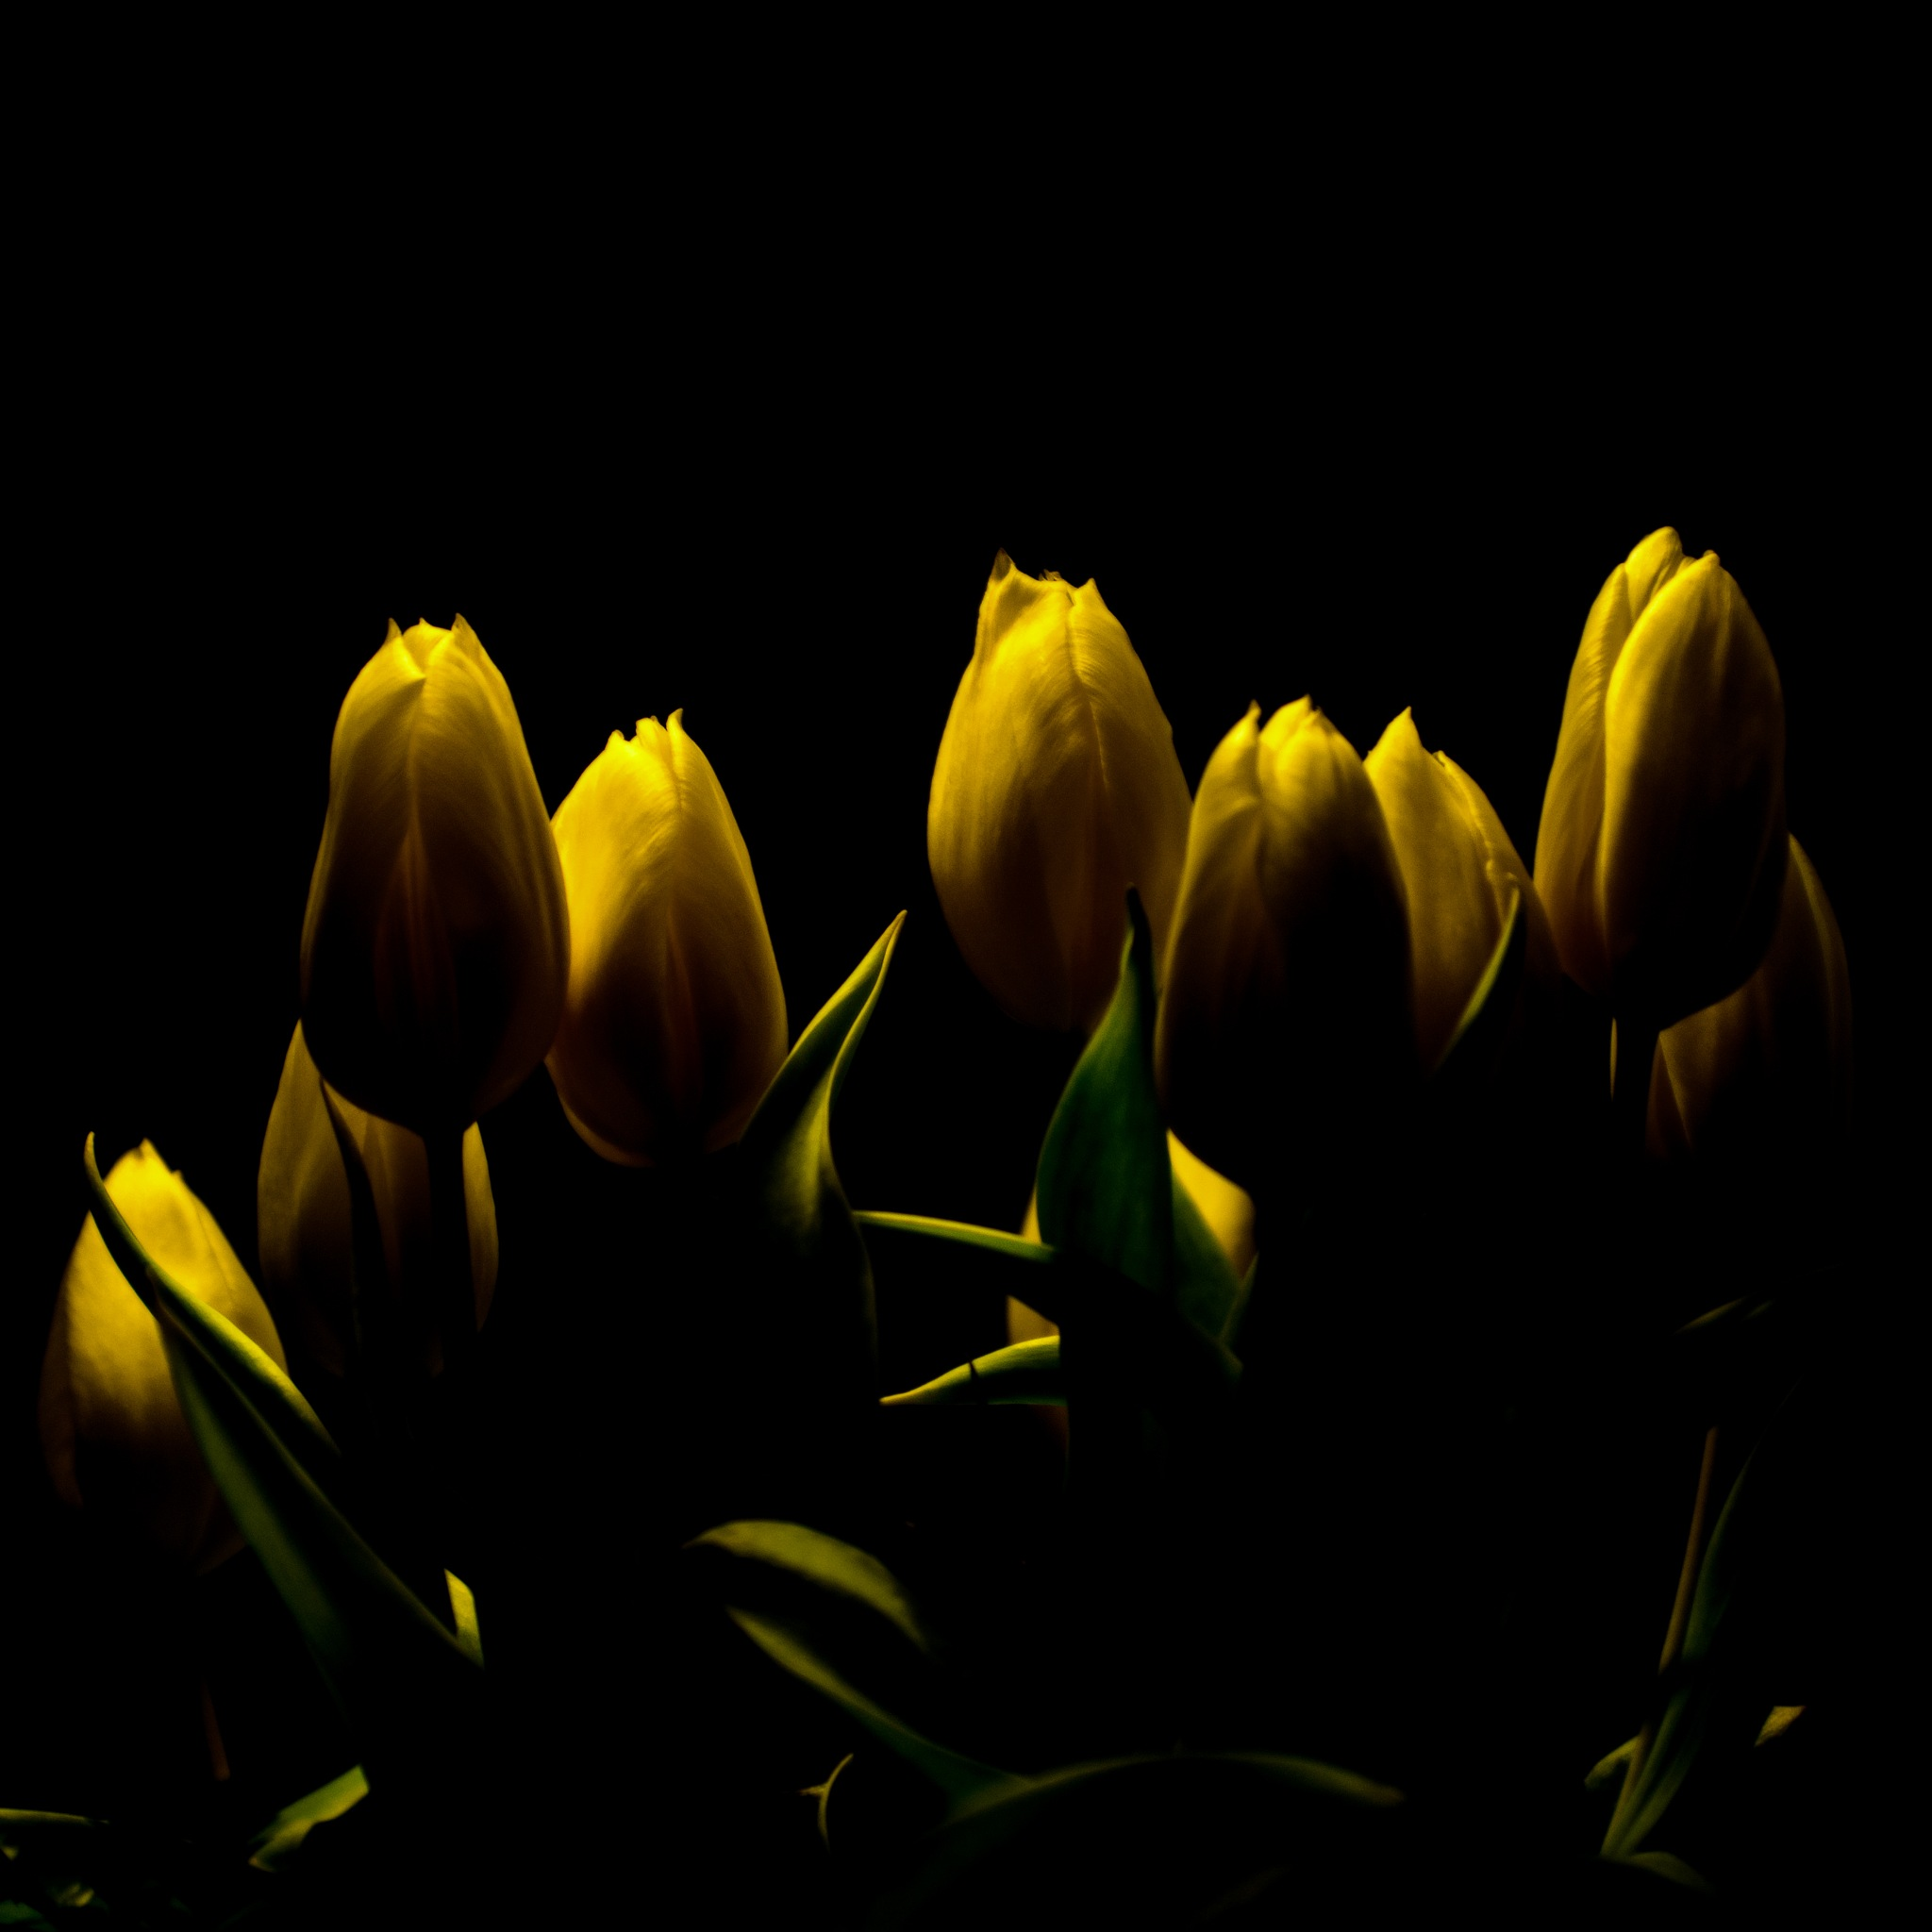 y-tulip by andreabergamo1